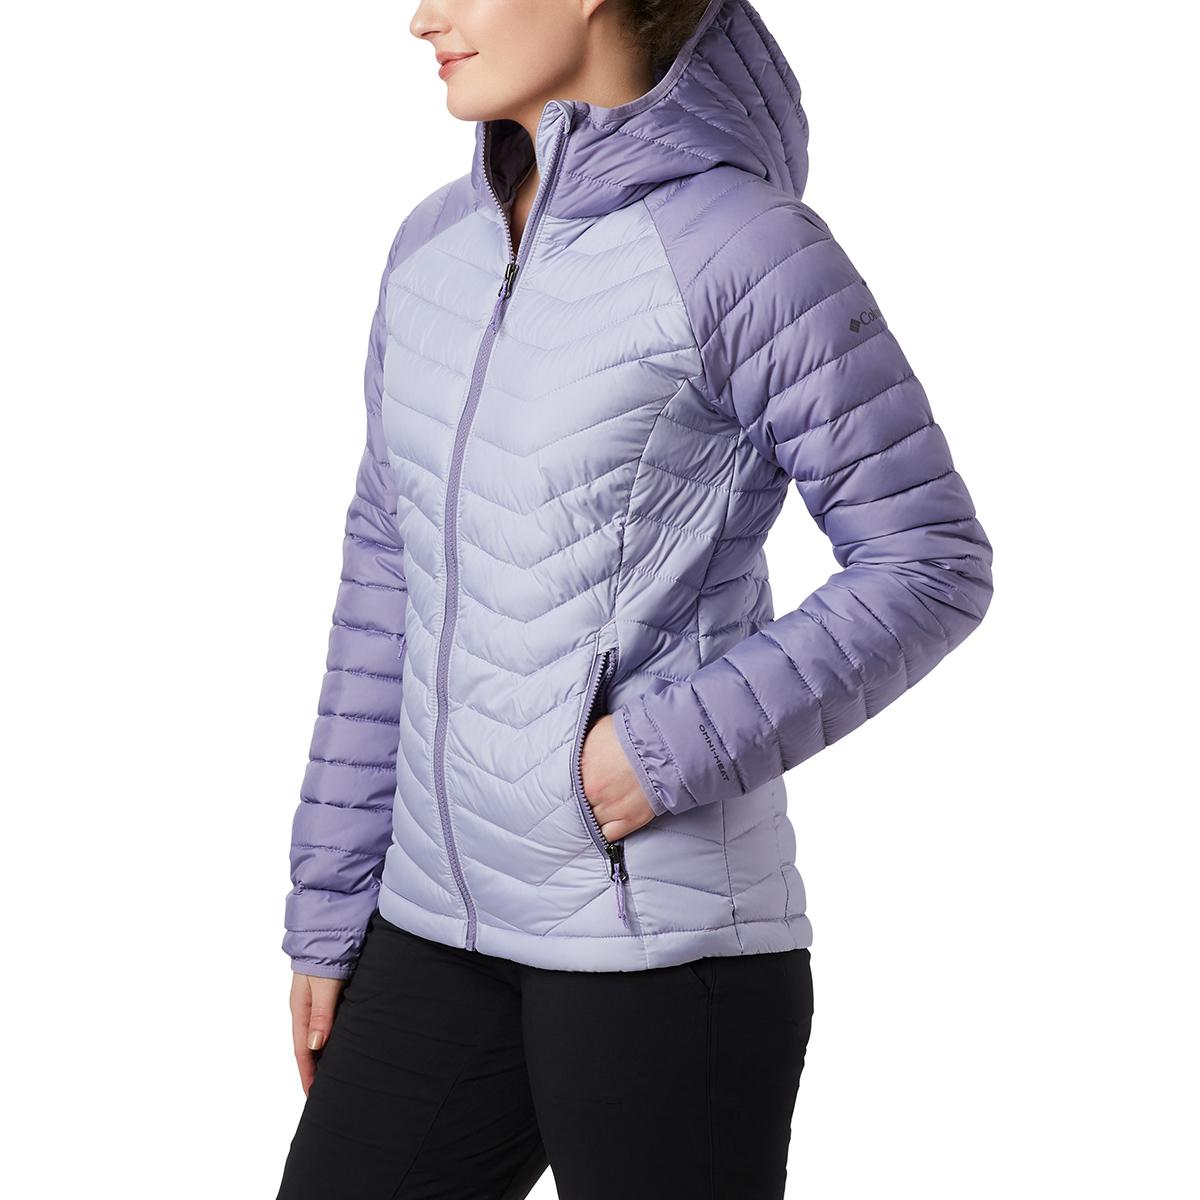 Columbia Women's Powder Lite Hooded Jacket - Purple, S